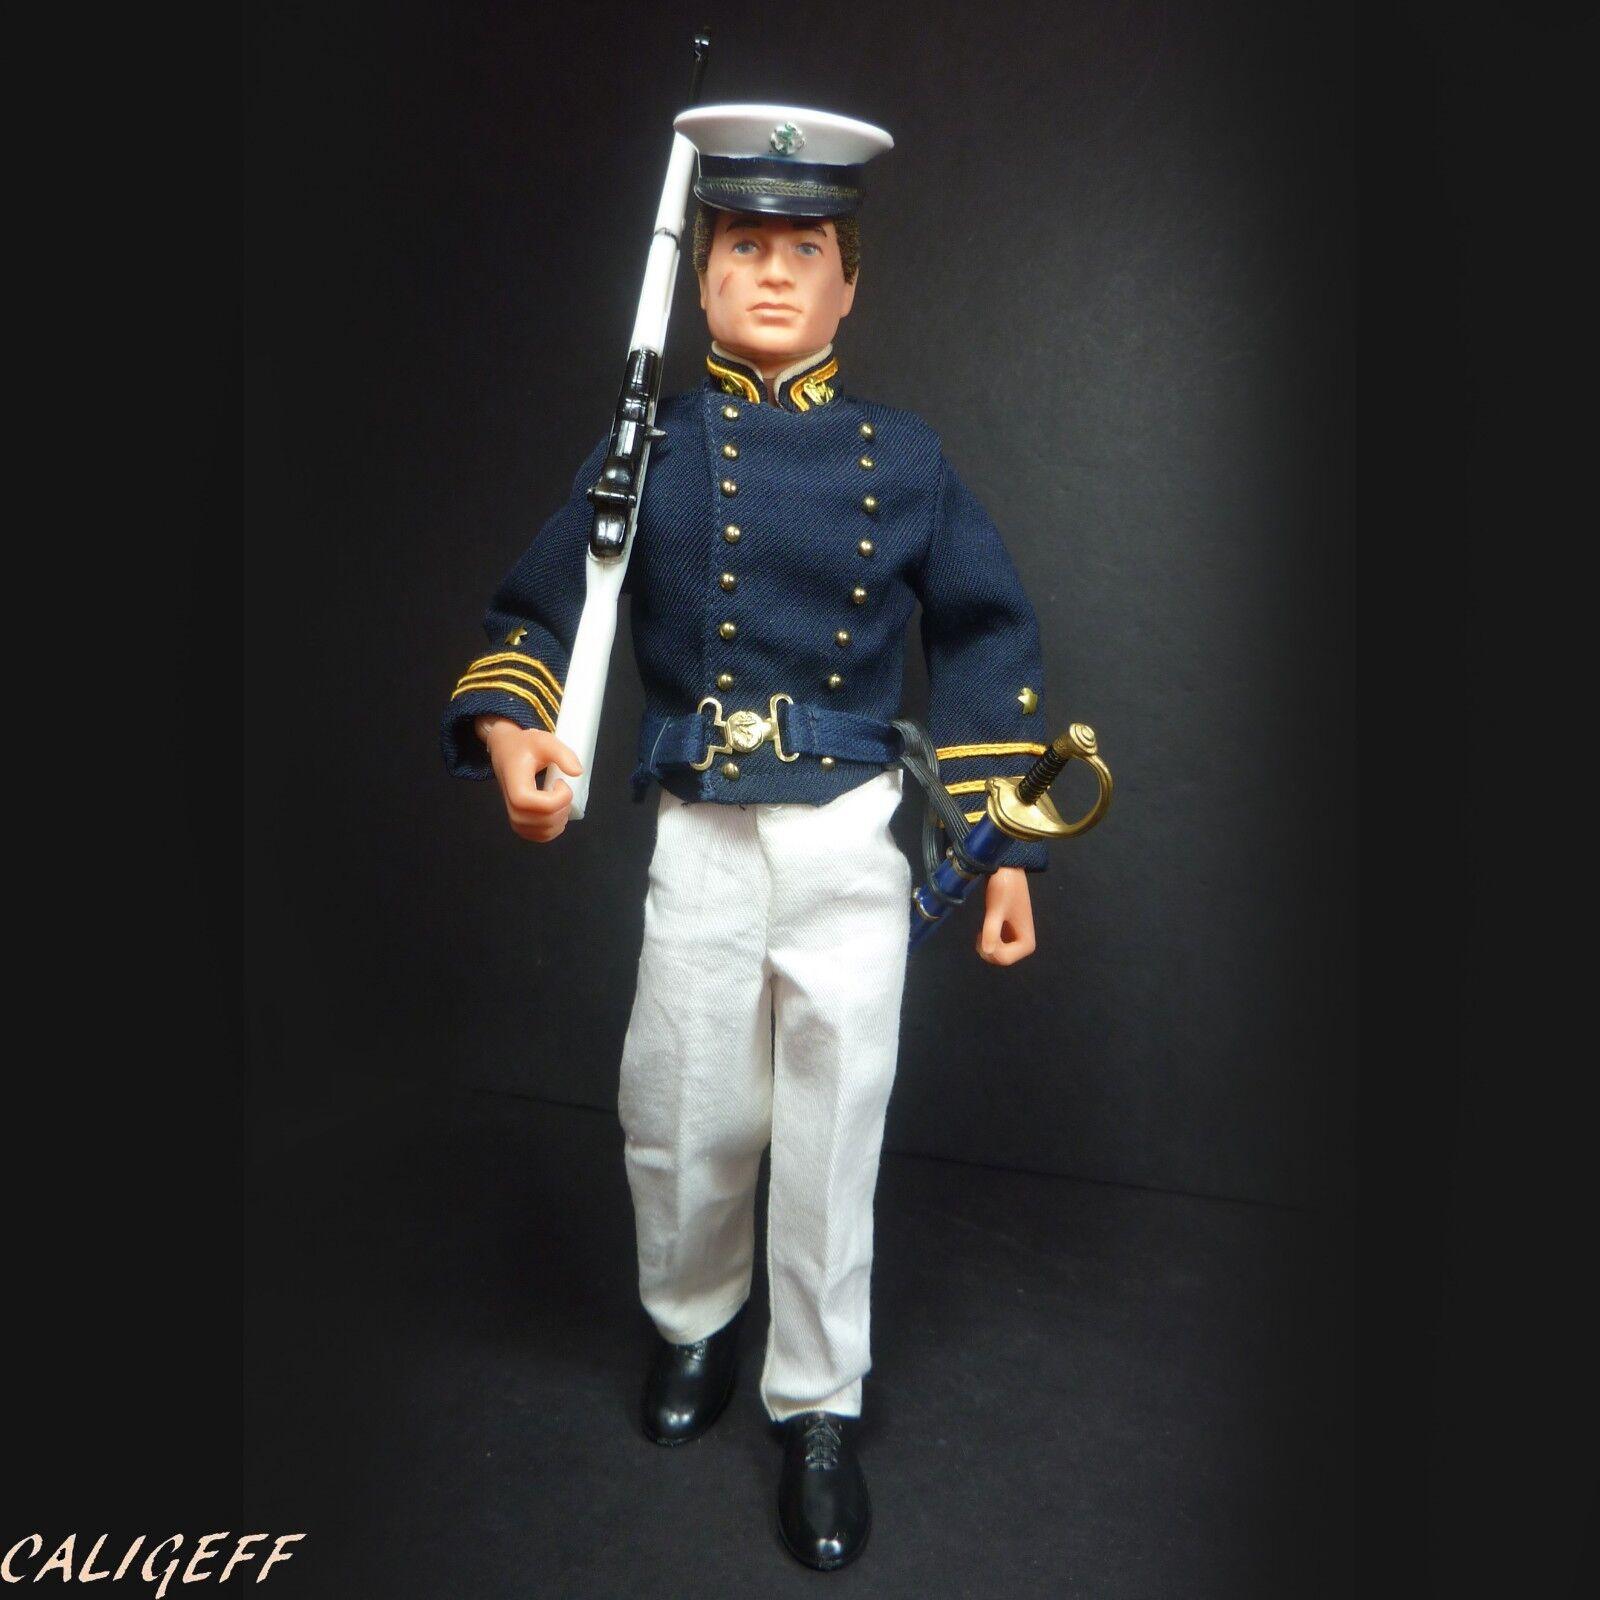 Vintage 1970's Action Team Annapolis Cadet - Action Man figure GI Joe